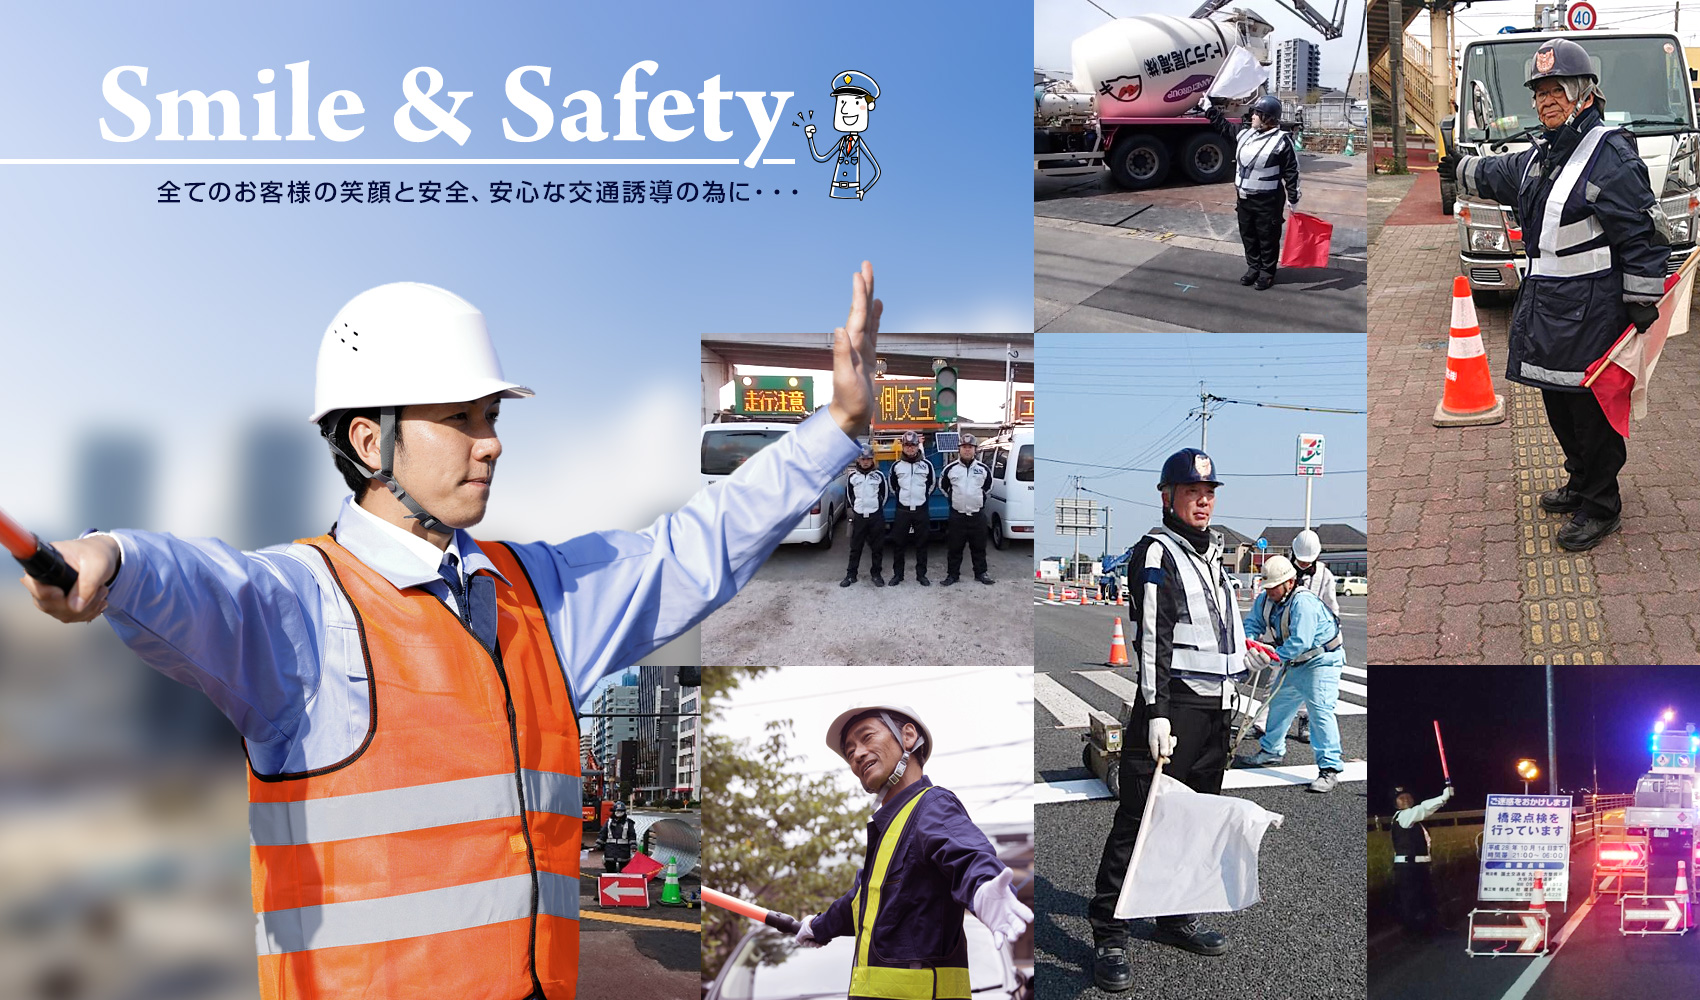 Smile & Safety 全てのお客様の笑顔と安全、安心な交通誘導の為に…